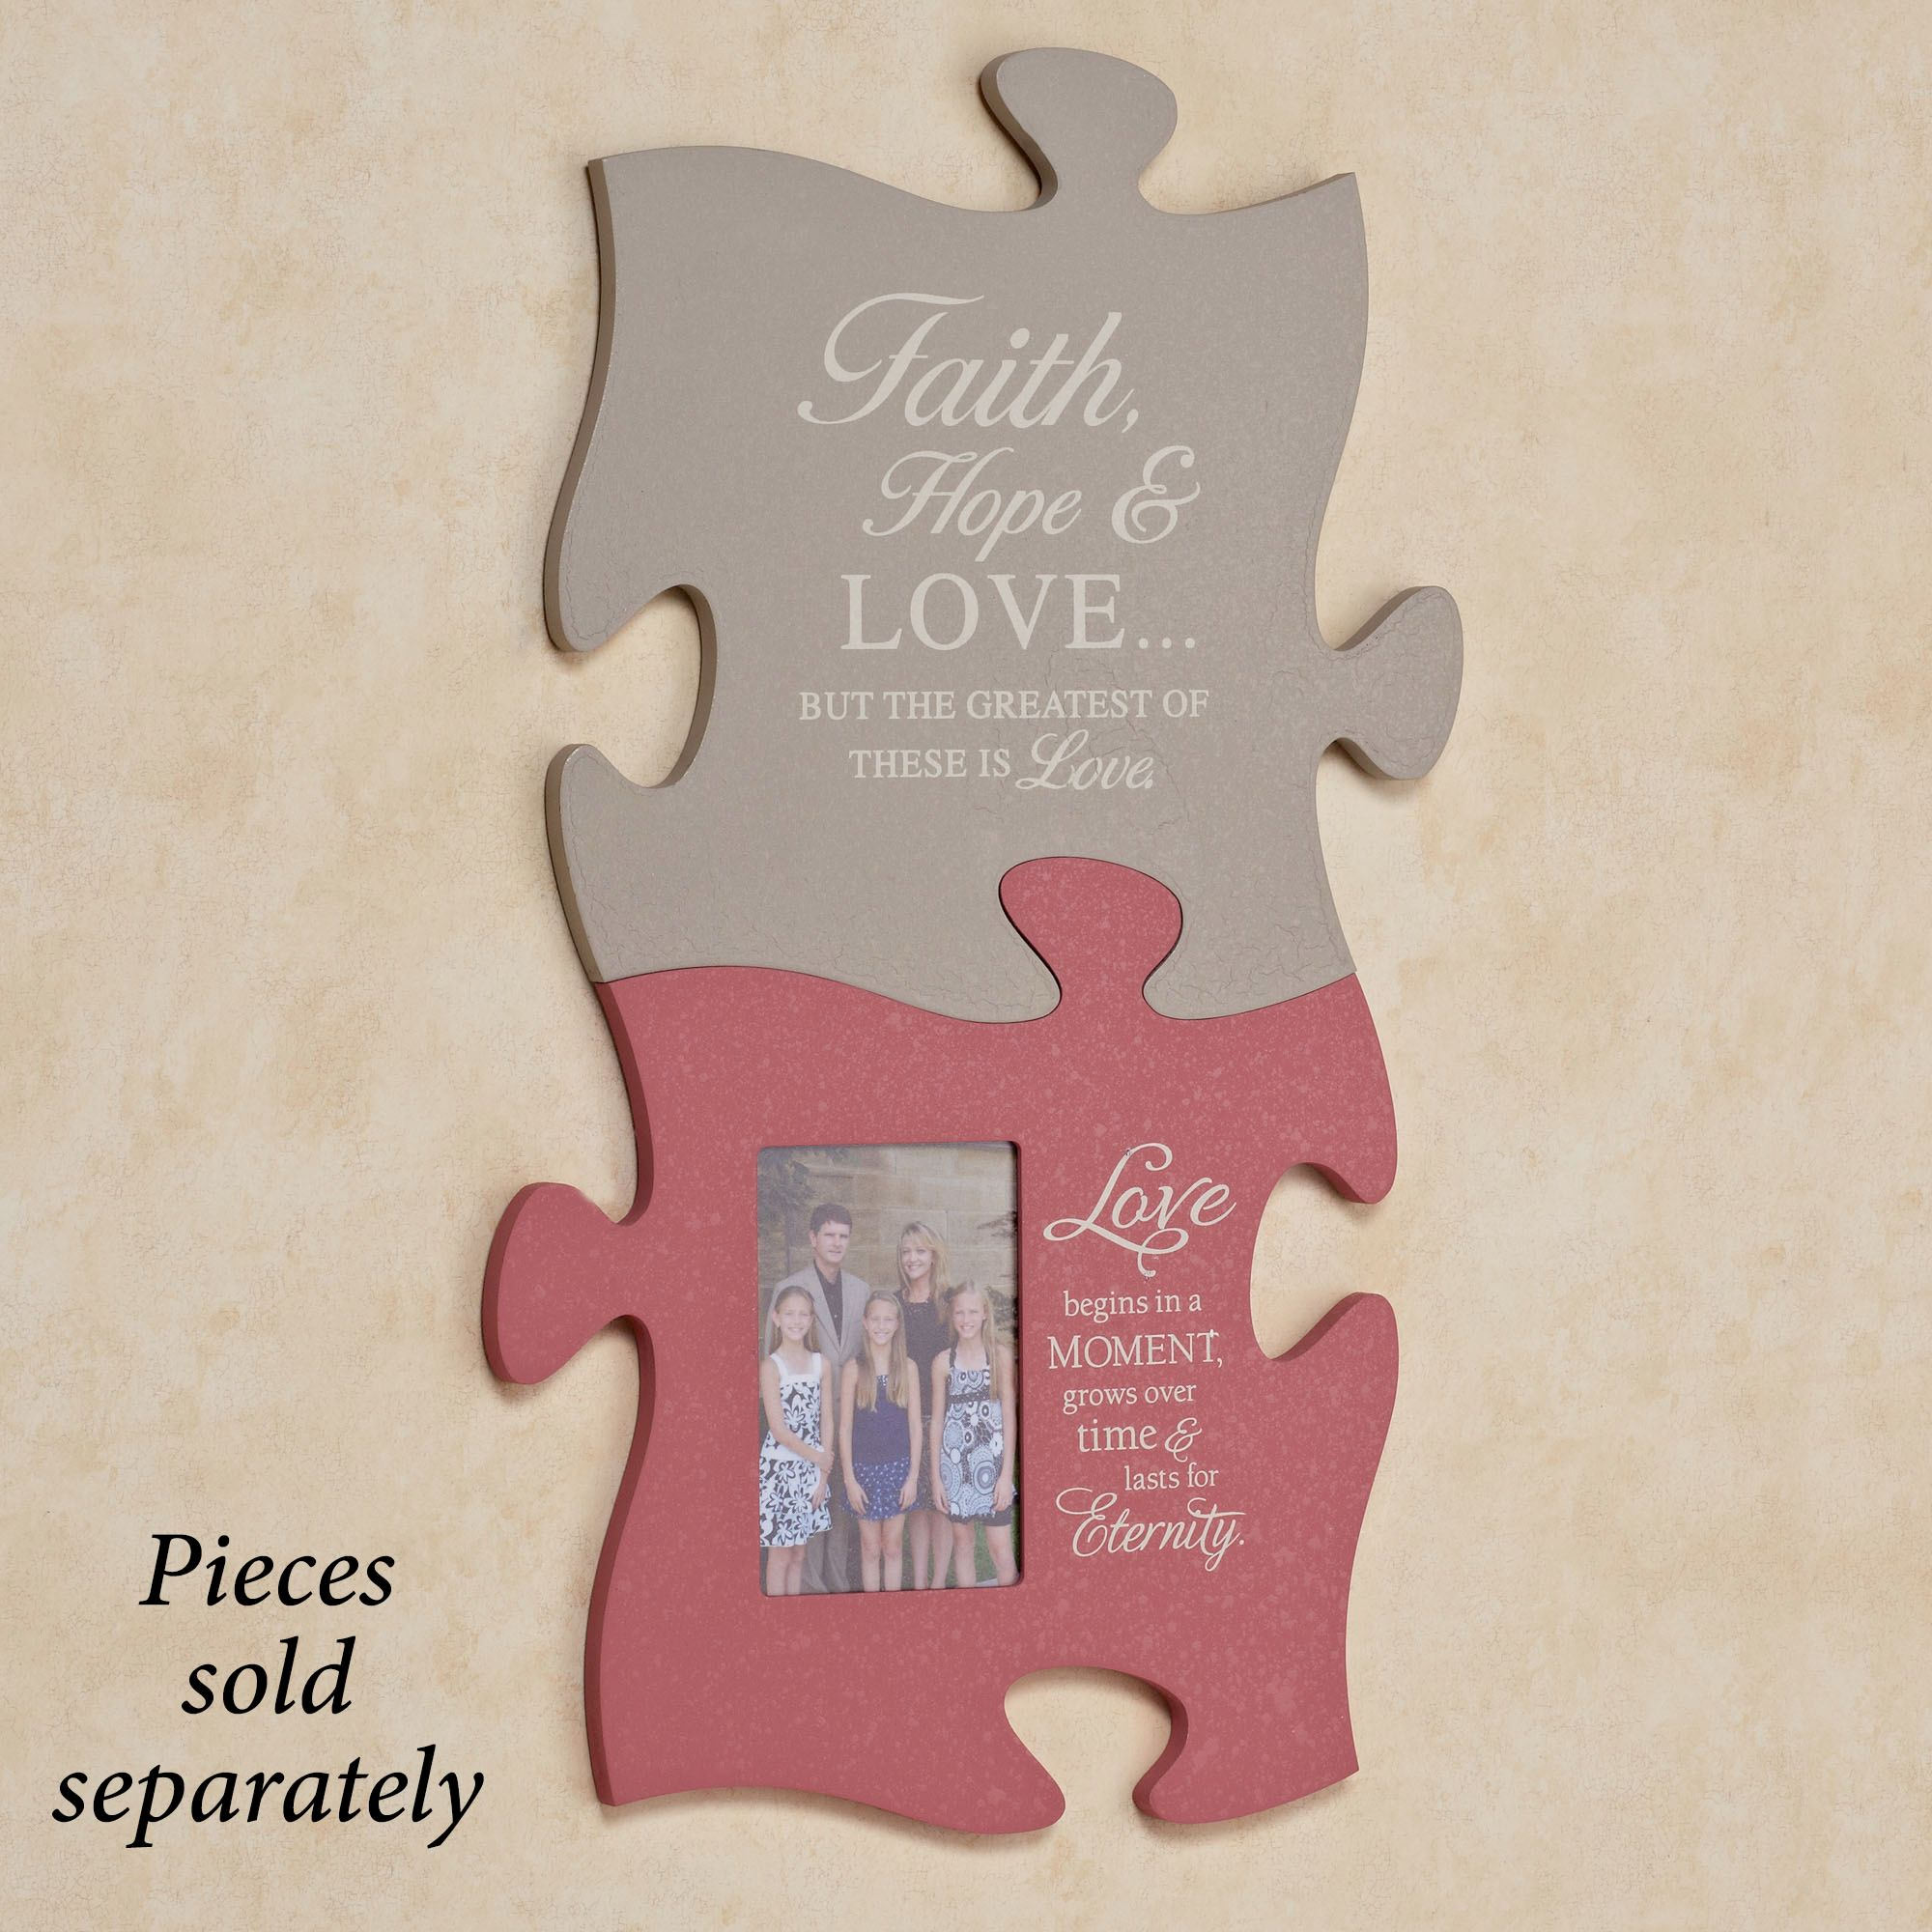 Love Puzzle Quotes: Puzzle Piece Quotes About Love. QuotesGram